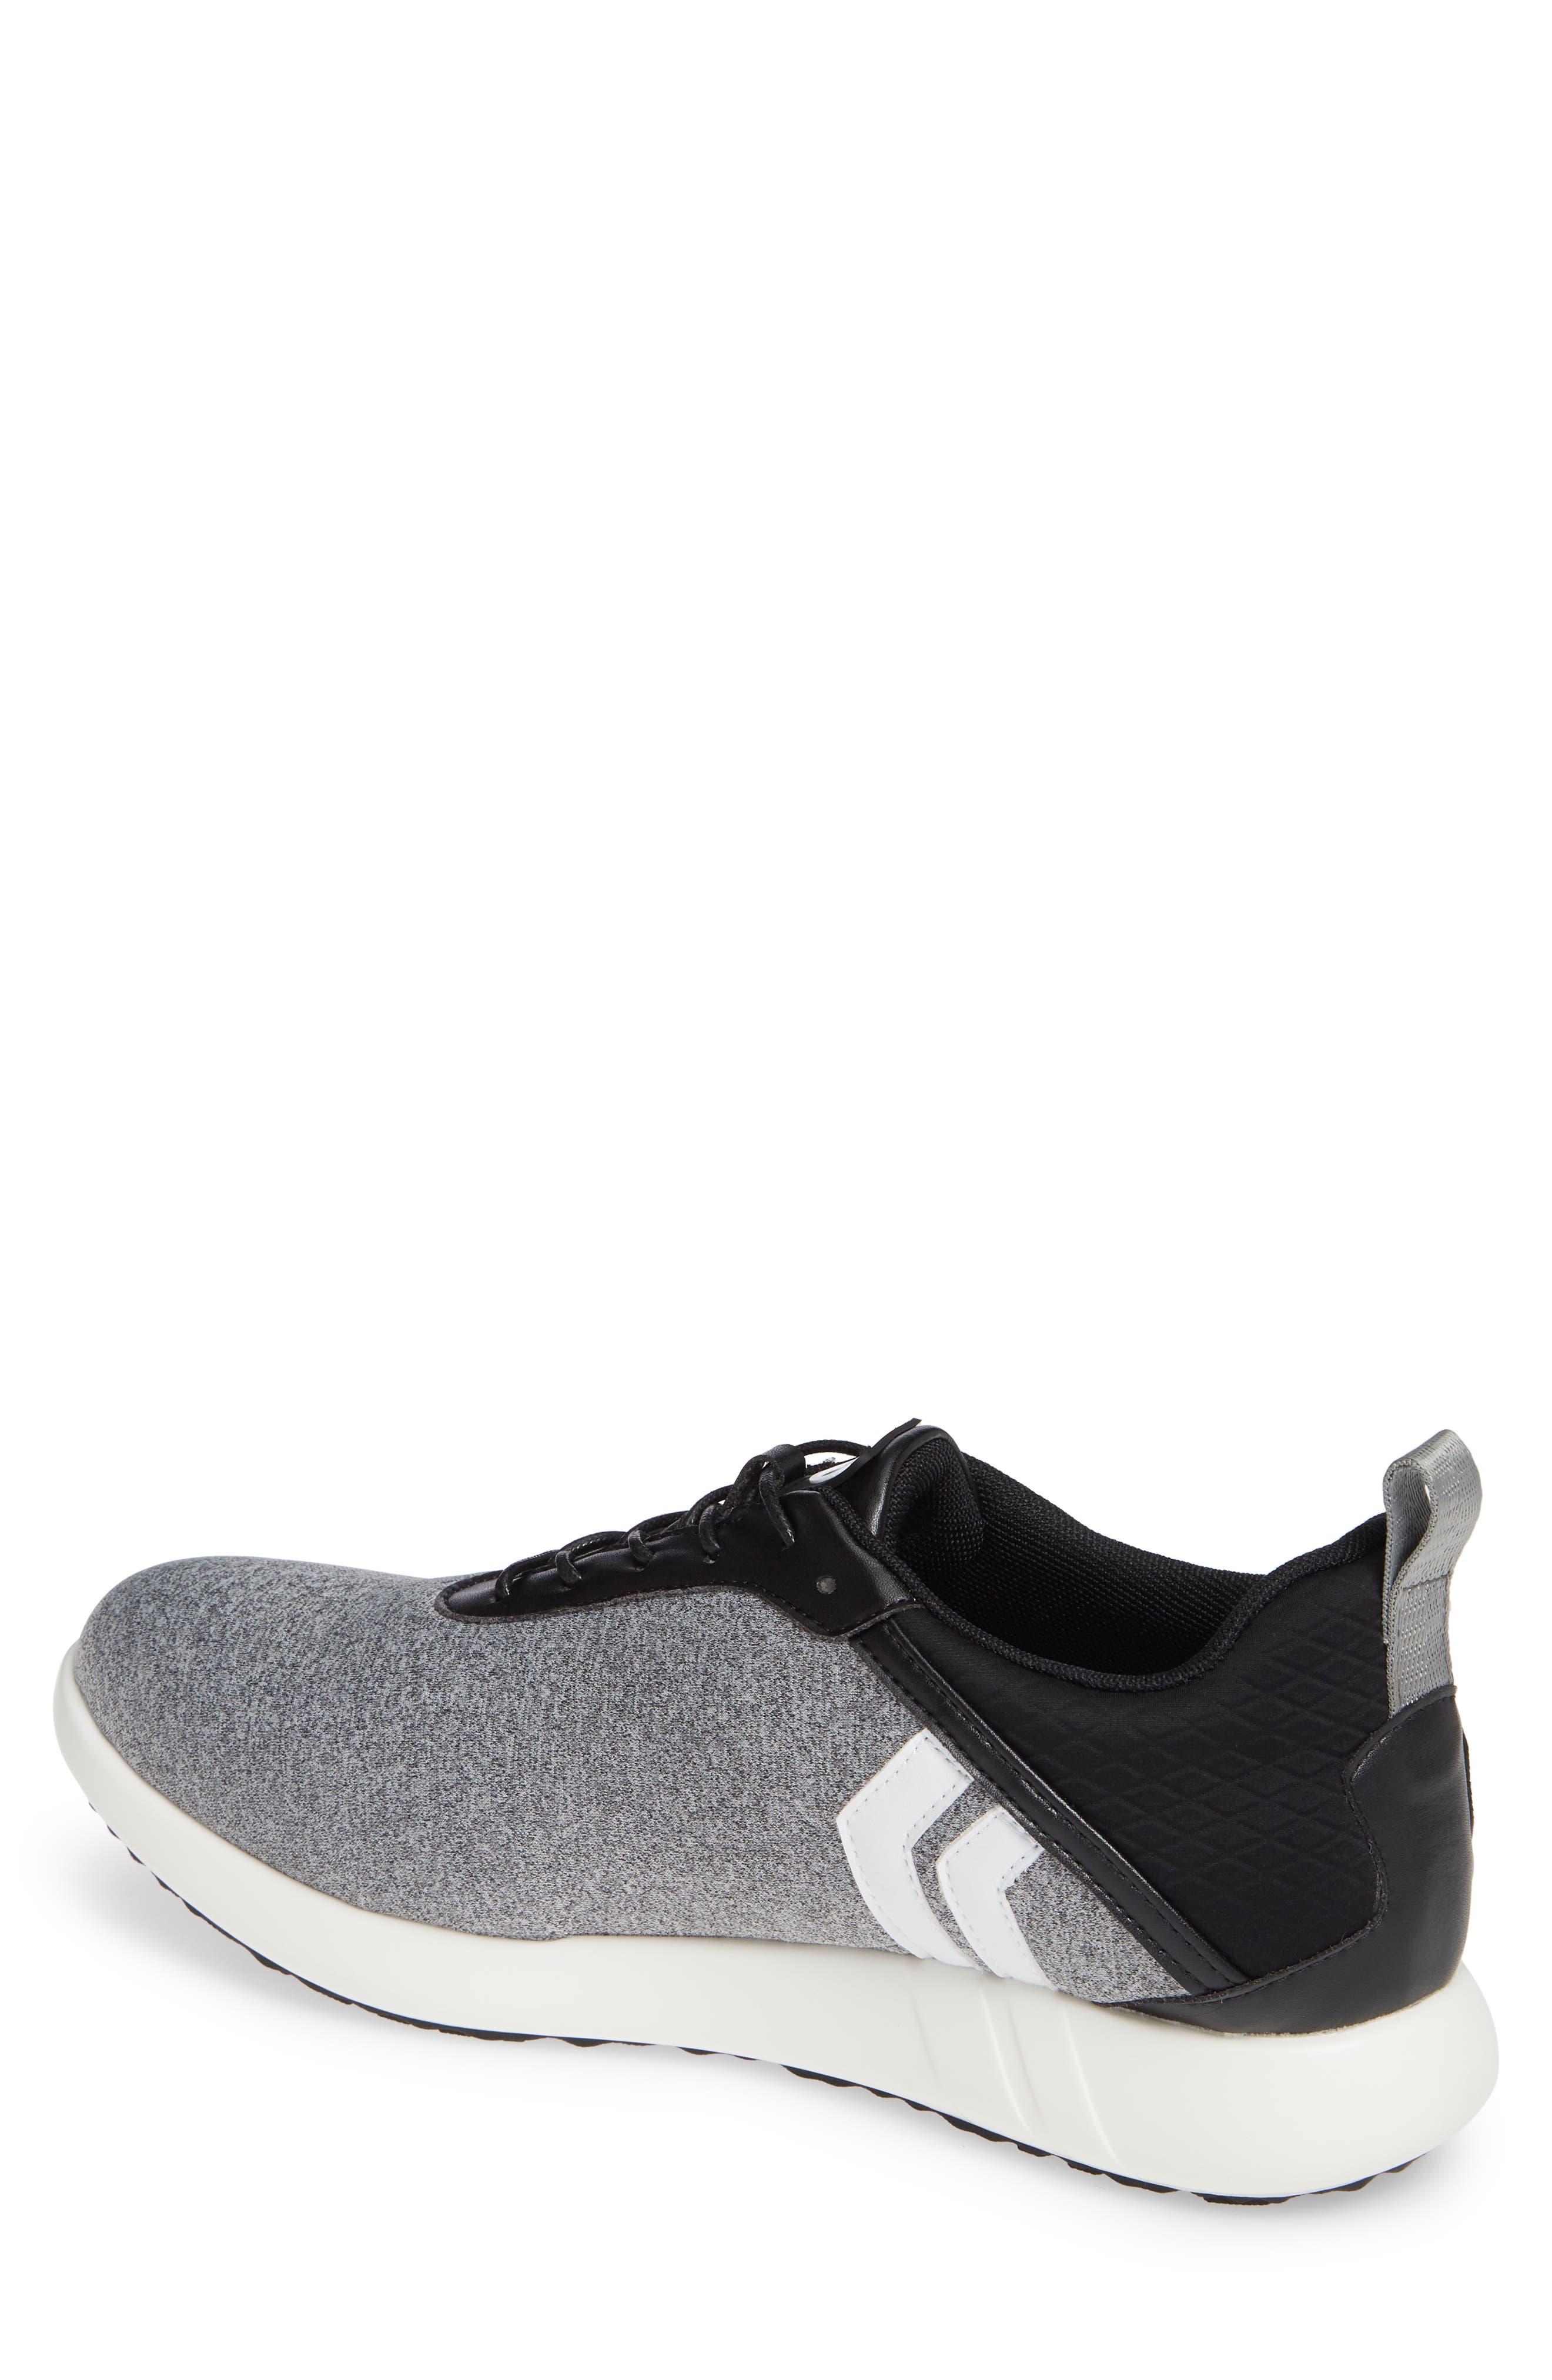 Avalon Sneaker,                             Alternate thumbnail 2, color,                             GREY FABRIC